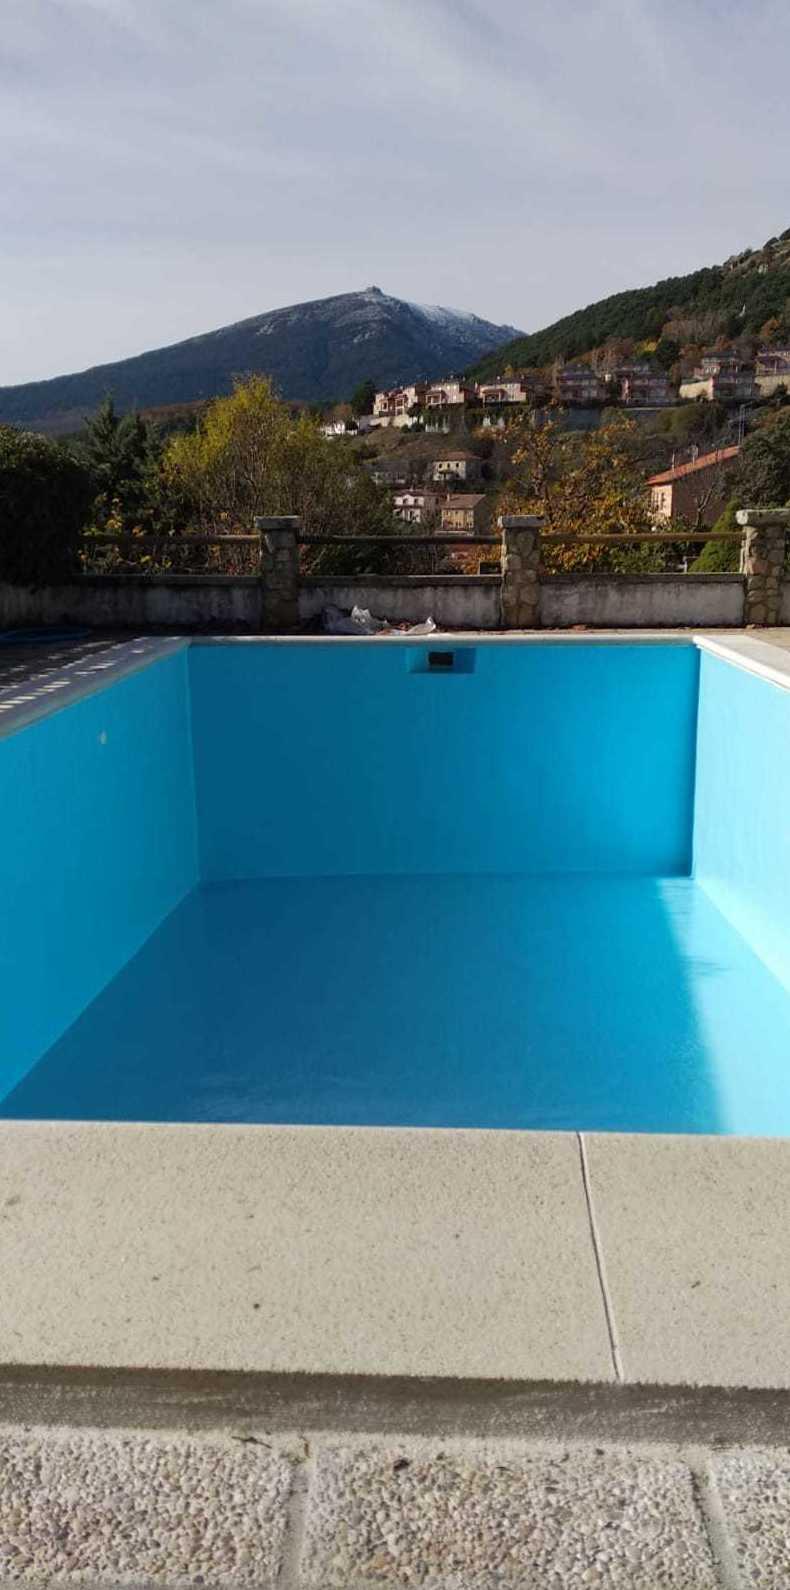 Foto 8 de Instalación de piscinas en Leganés | Lallana Pol